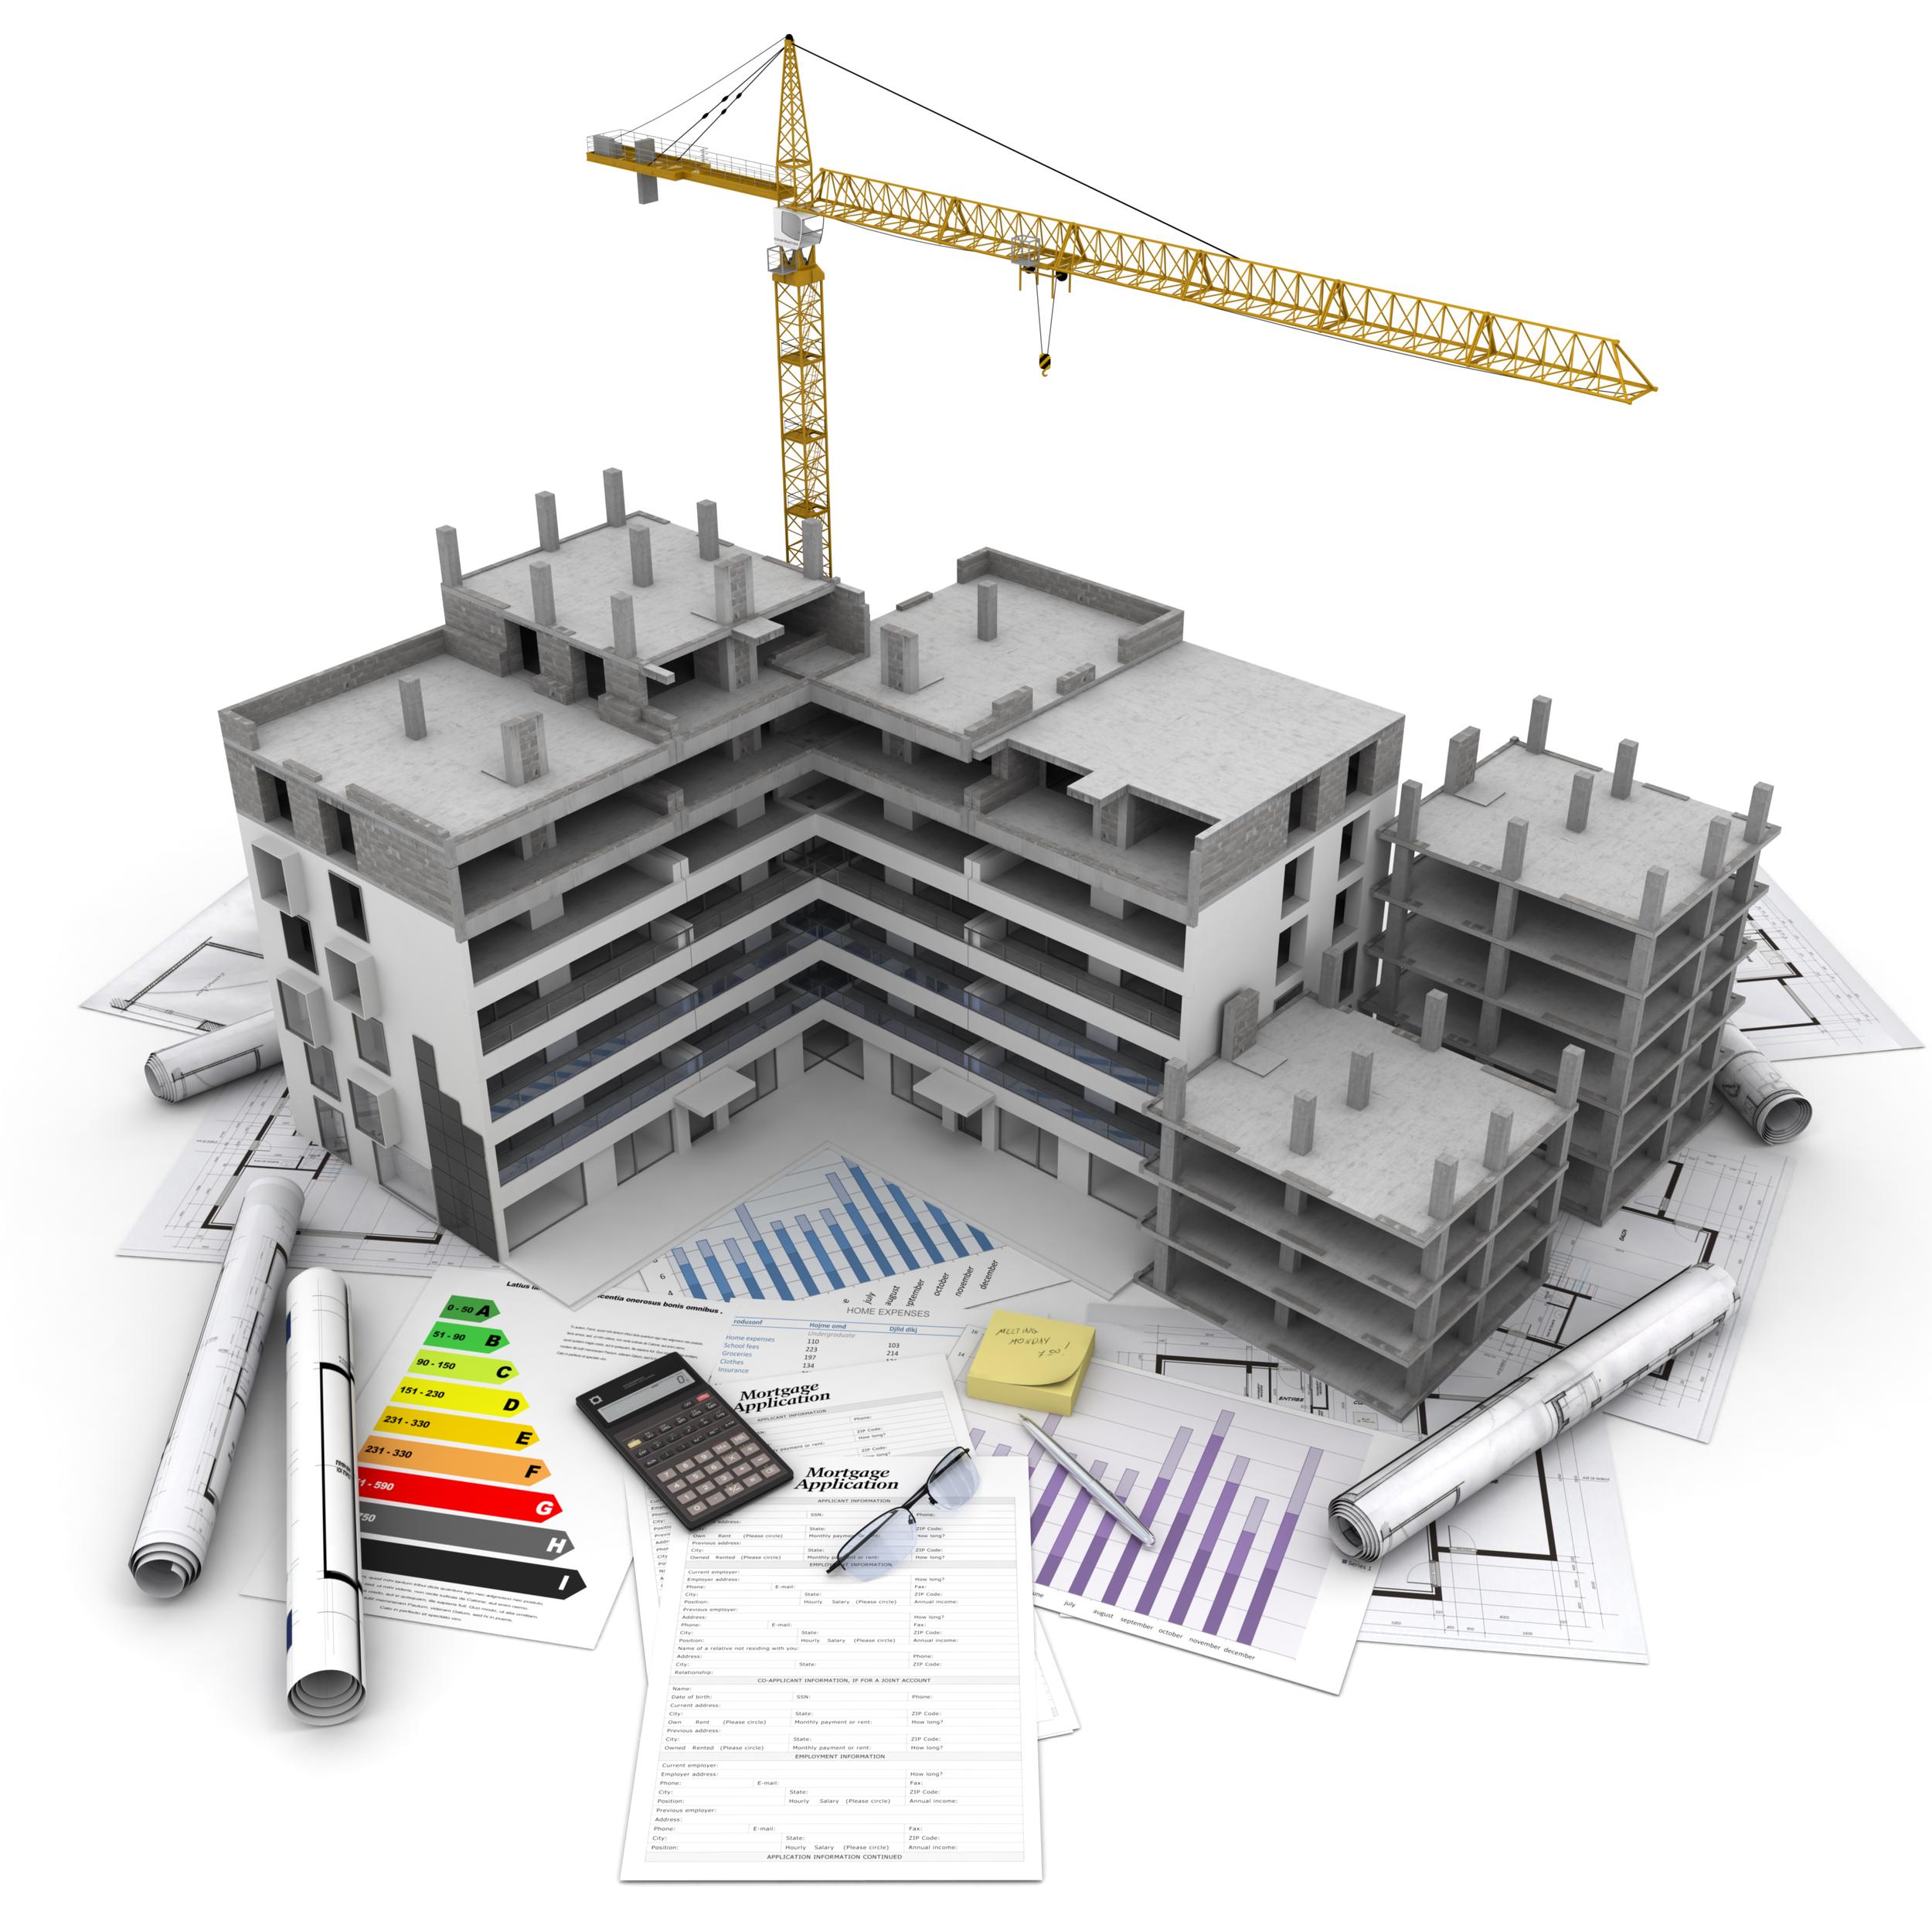 bigstock-Building-under-construction-wi-46049473.jpg